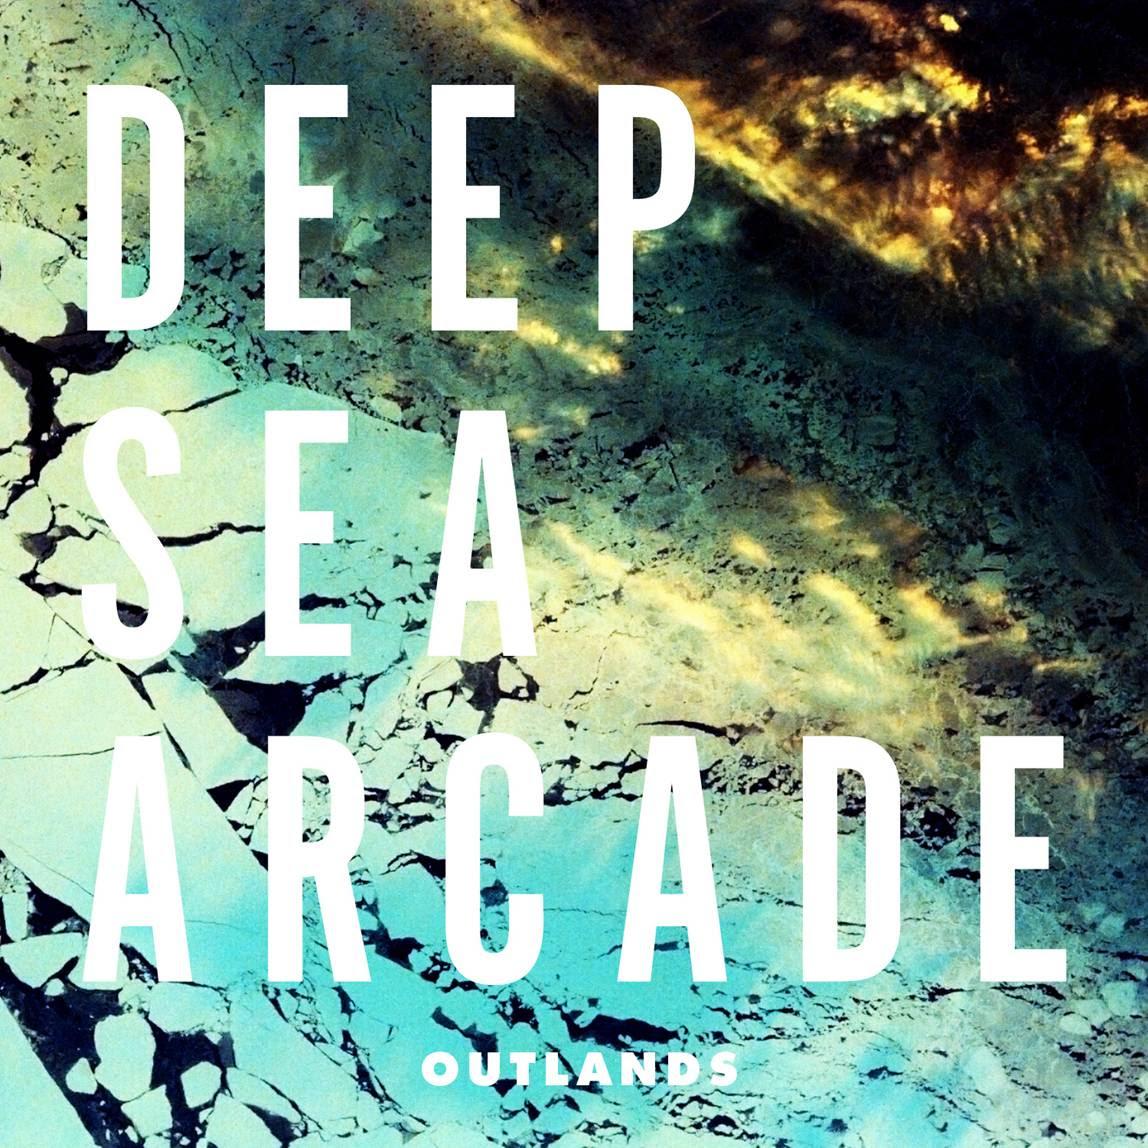 Outlands by Deep Sea Arcade